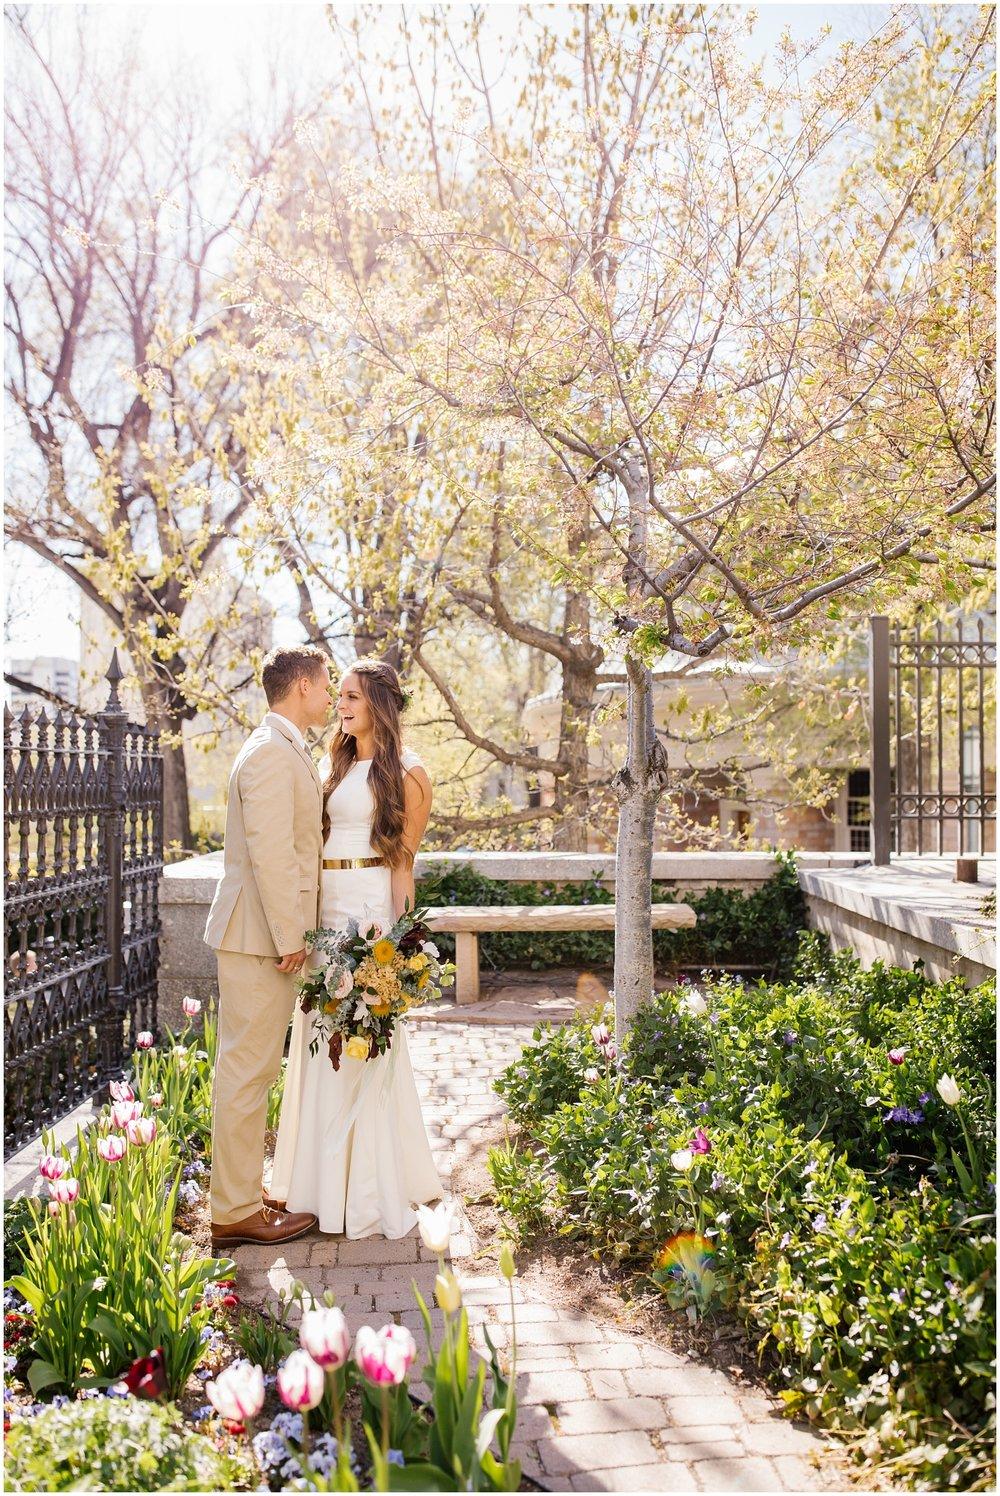 JC-Wedding-176_Lizzie-B-Imagery-Utah-Wedding-Photographer-Park-City-Salt-Lake-City-Temple-Joseph-Smith-Memorial-Building-Empire-Room.jpg